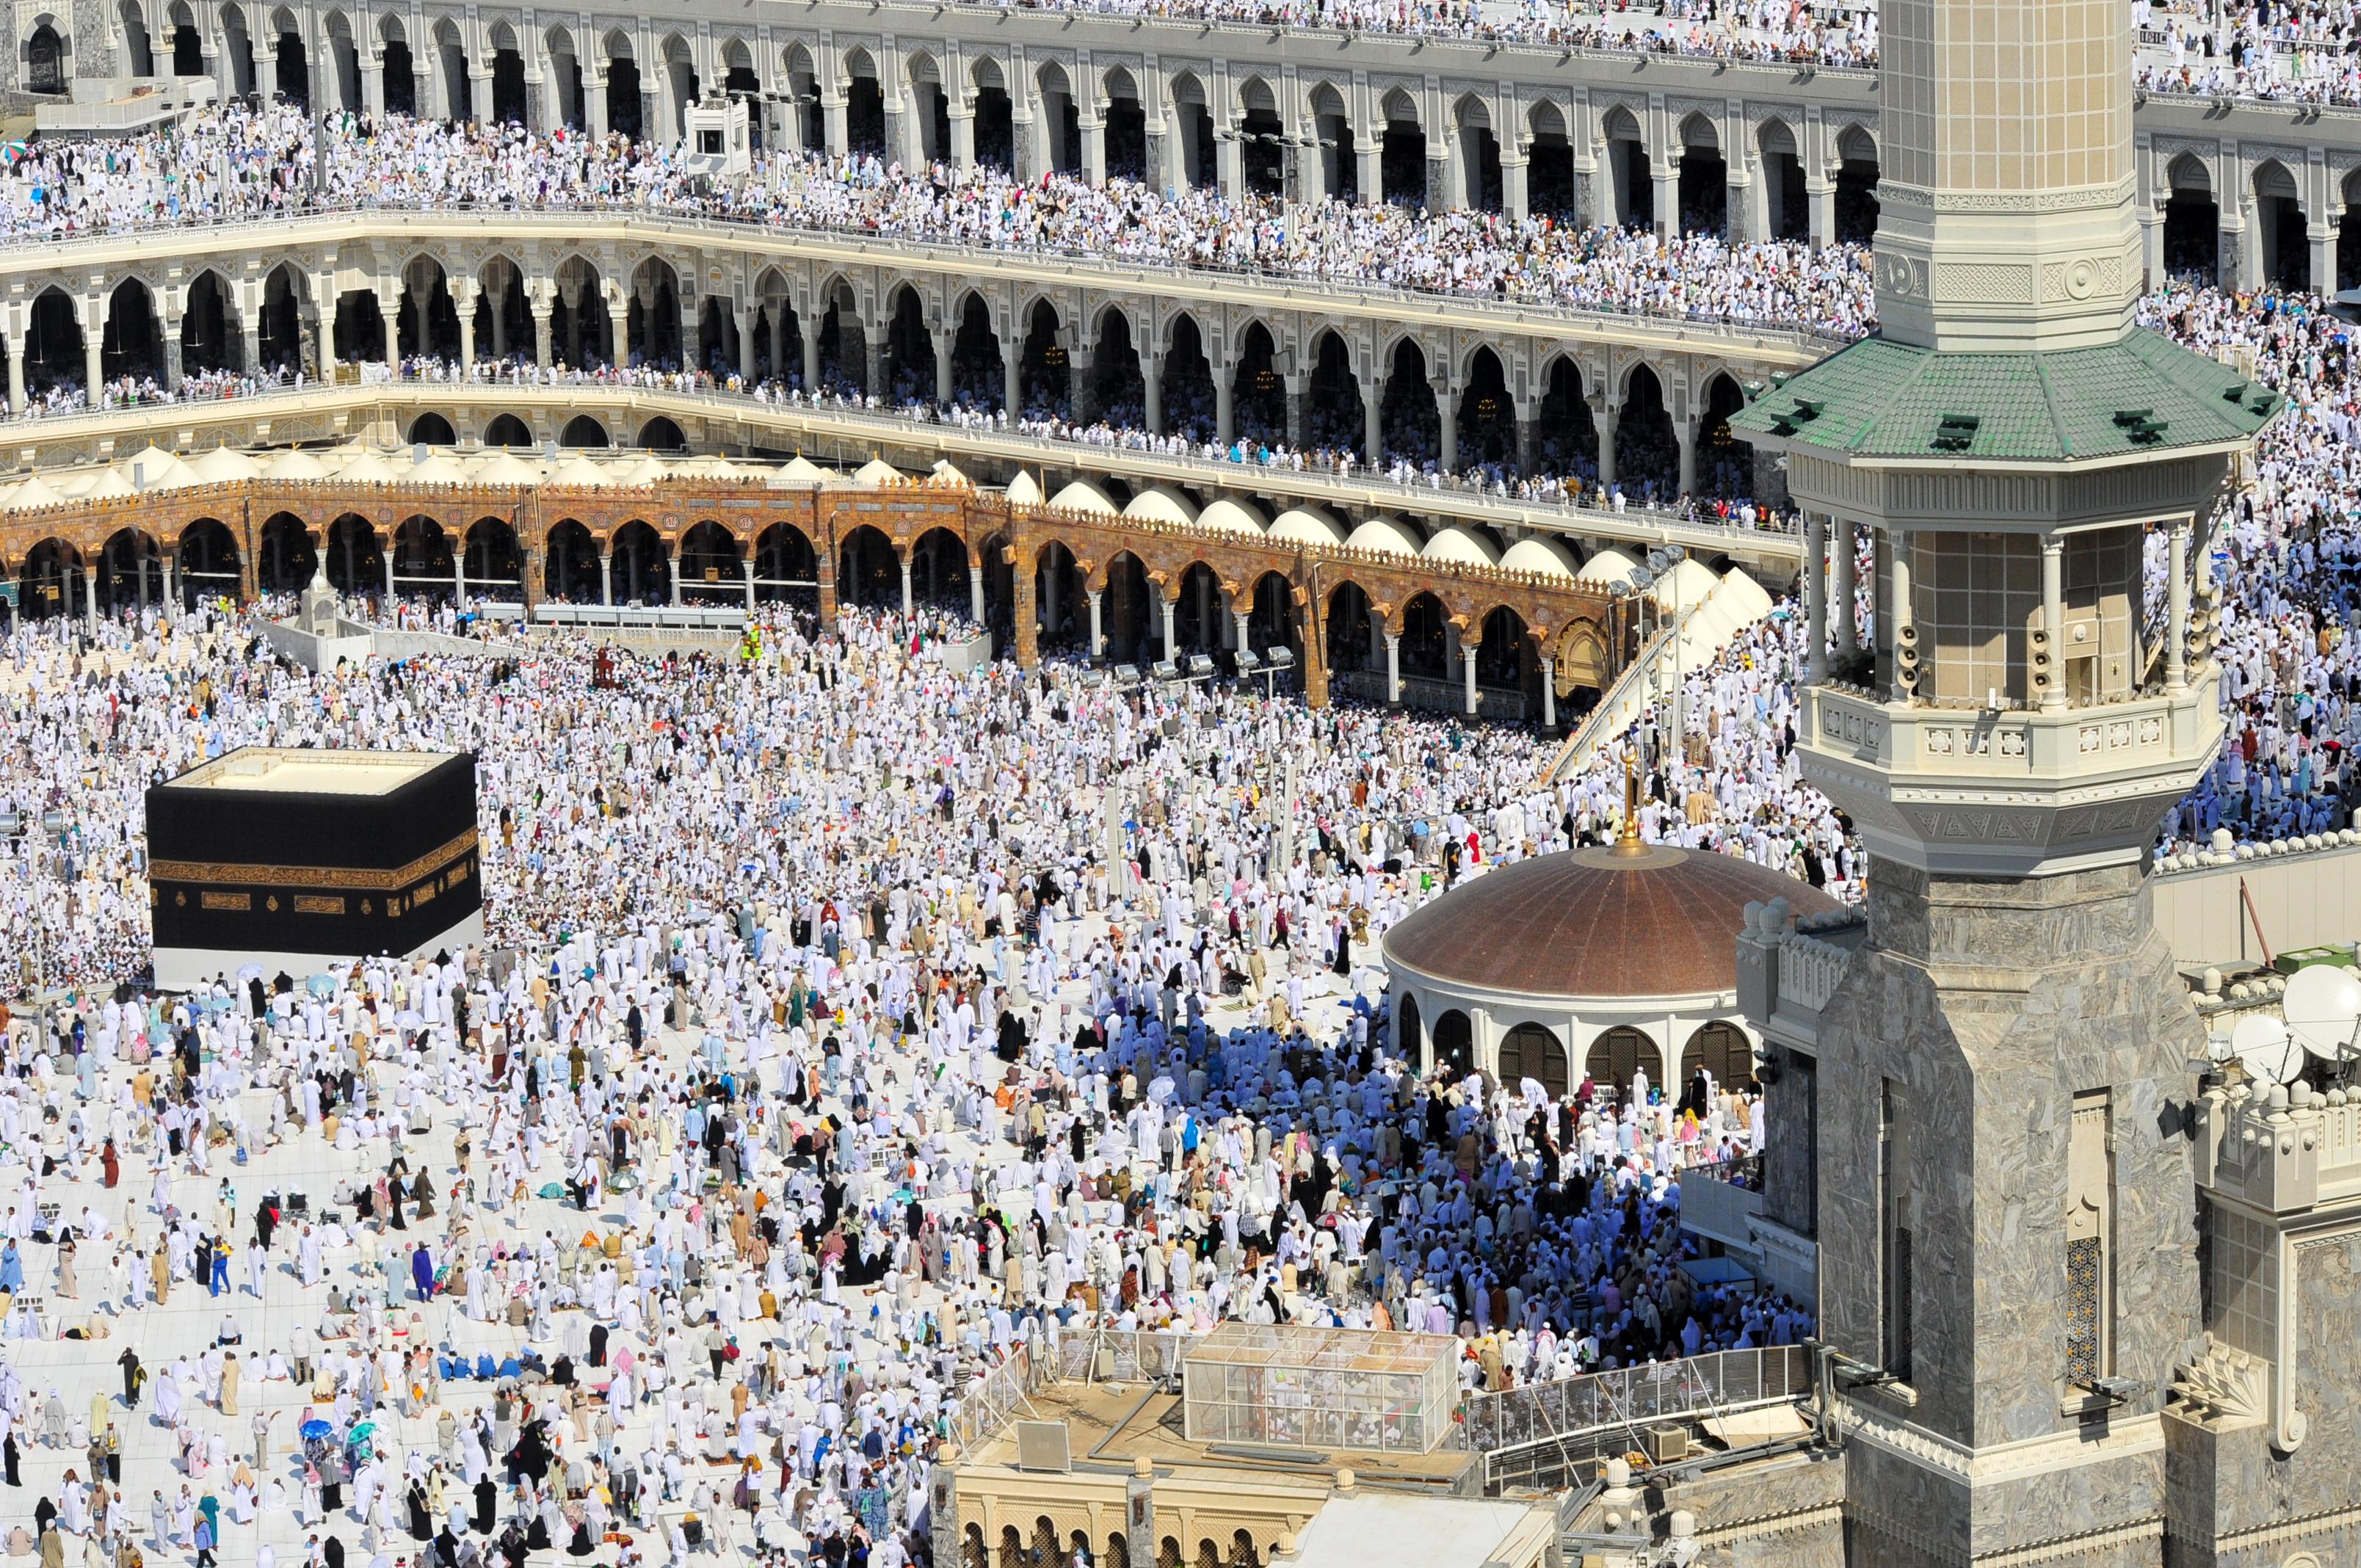 What are important during Hajj: Ihram, Presence at Arafat on Hajj day,Tawafal-Ifadah. And Sa'y between As-Safa and Al-Marwah? Sacrifice of animal, Tawafal-Ifadah on 10th Three types of hajjand quranmualim Learn Quran, Quran translation, Quran mp3,quran explorer, Quran download, Quran translation in Urdu English to Arabic, almualim, quranmualim, islam pictures, Islam symbol, Shia Islam, Sunni Islam, Islam facts],Islam beliefs and practices Islam religion history, Islam guide, prophet Muhammad quotes, prophet Muhammad biography, Prophet Muhammad family tree.